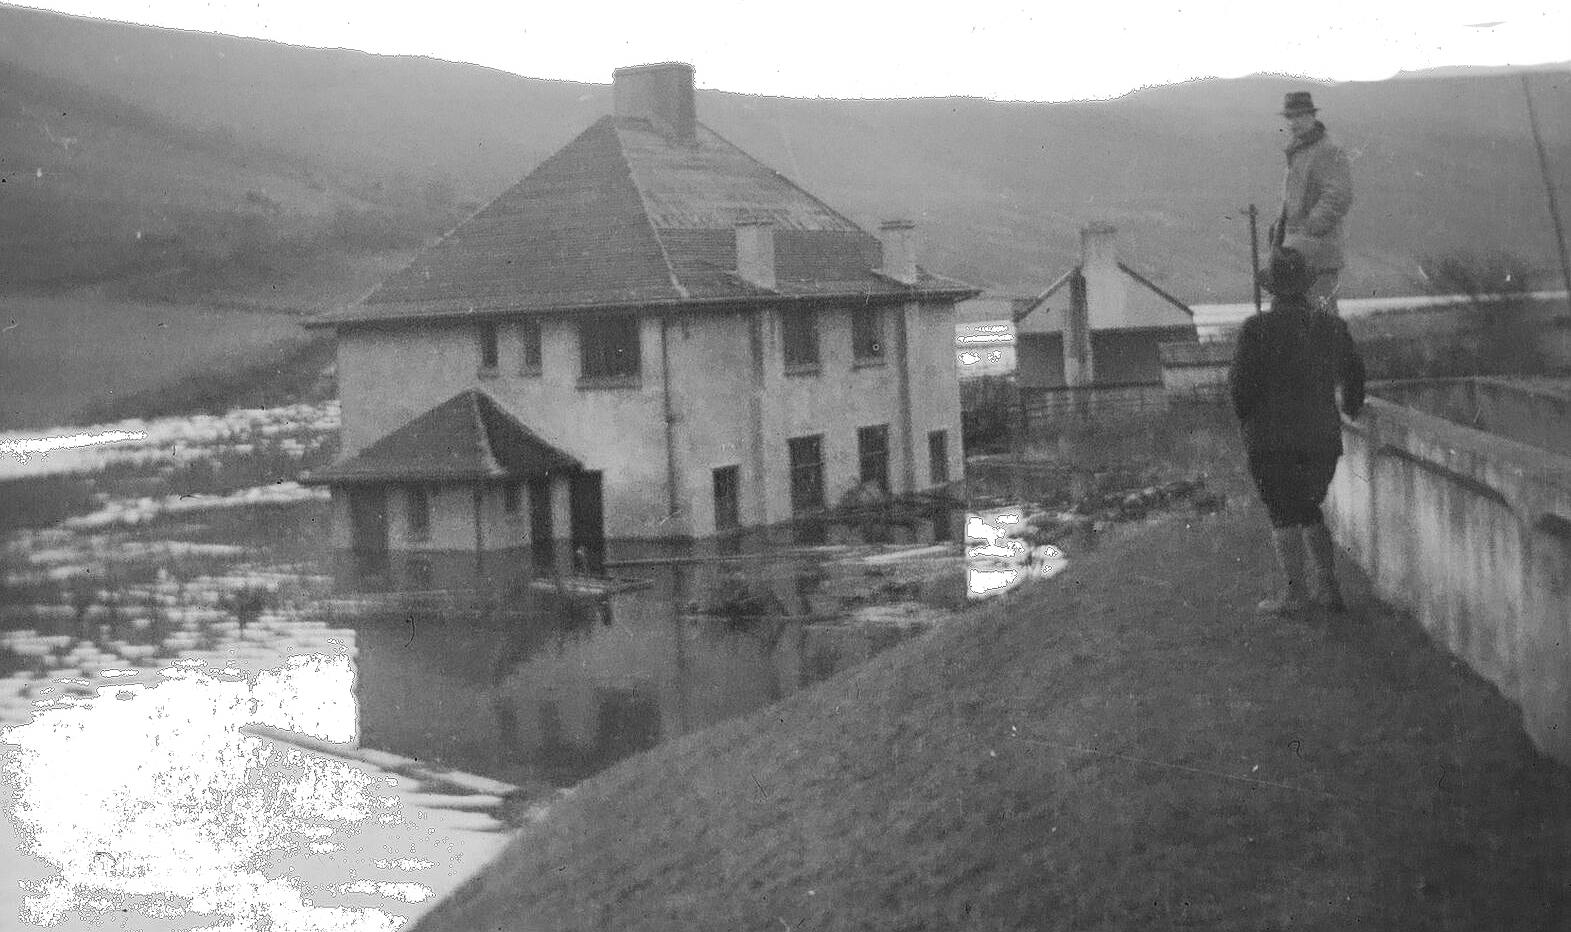 Submerging of the original Reservoir Houses 1938